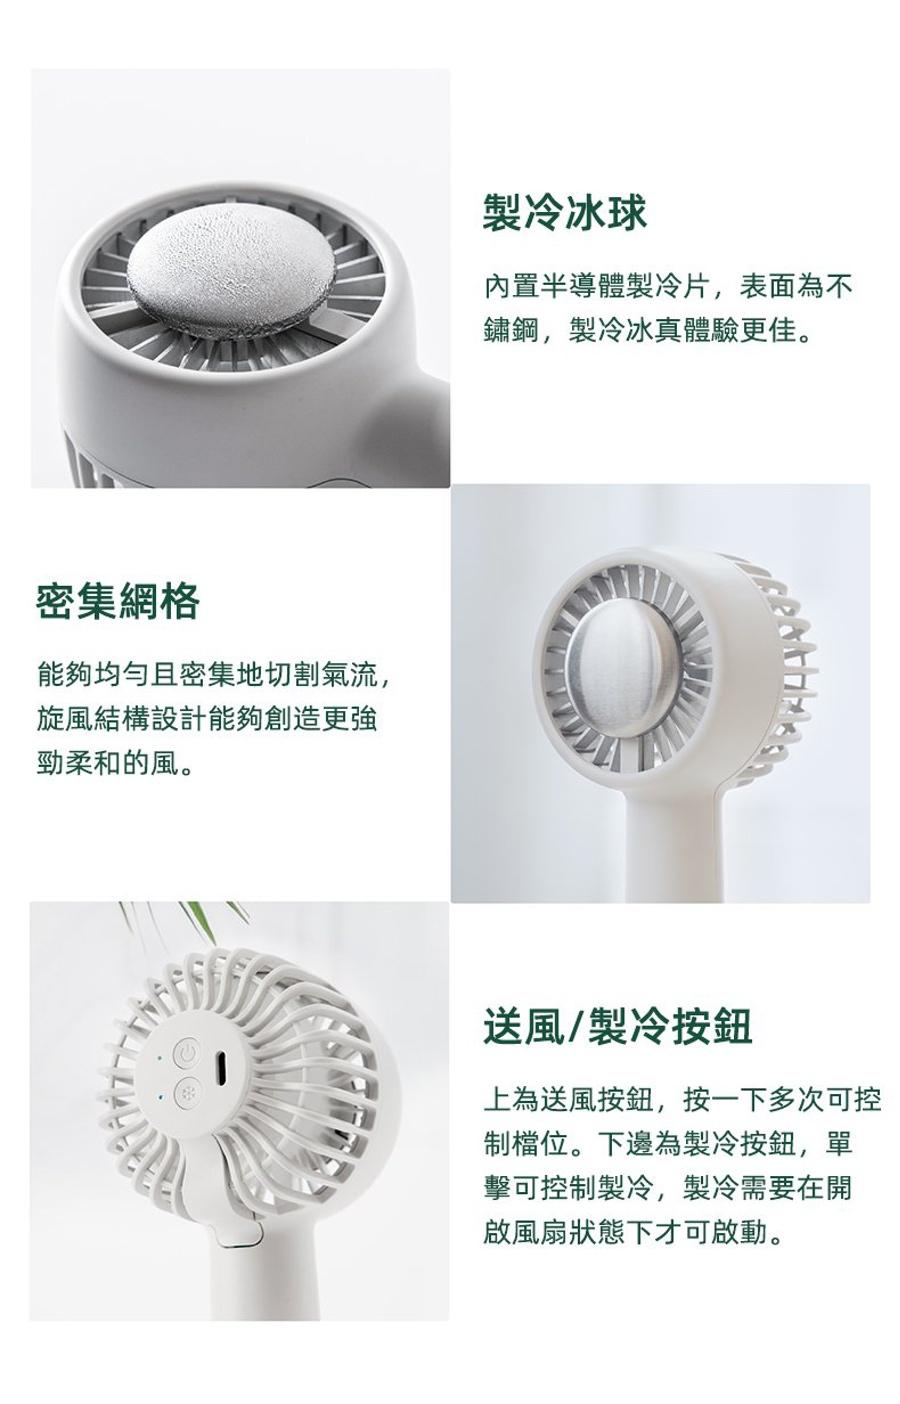 Ice Hockey Cooling Fan 冰球手提座枱兩用風扇